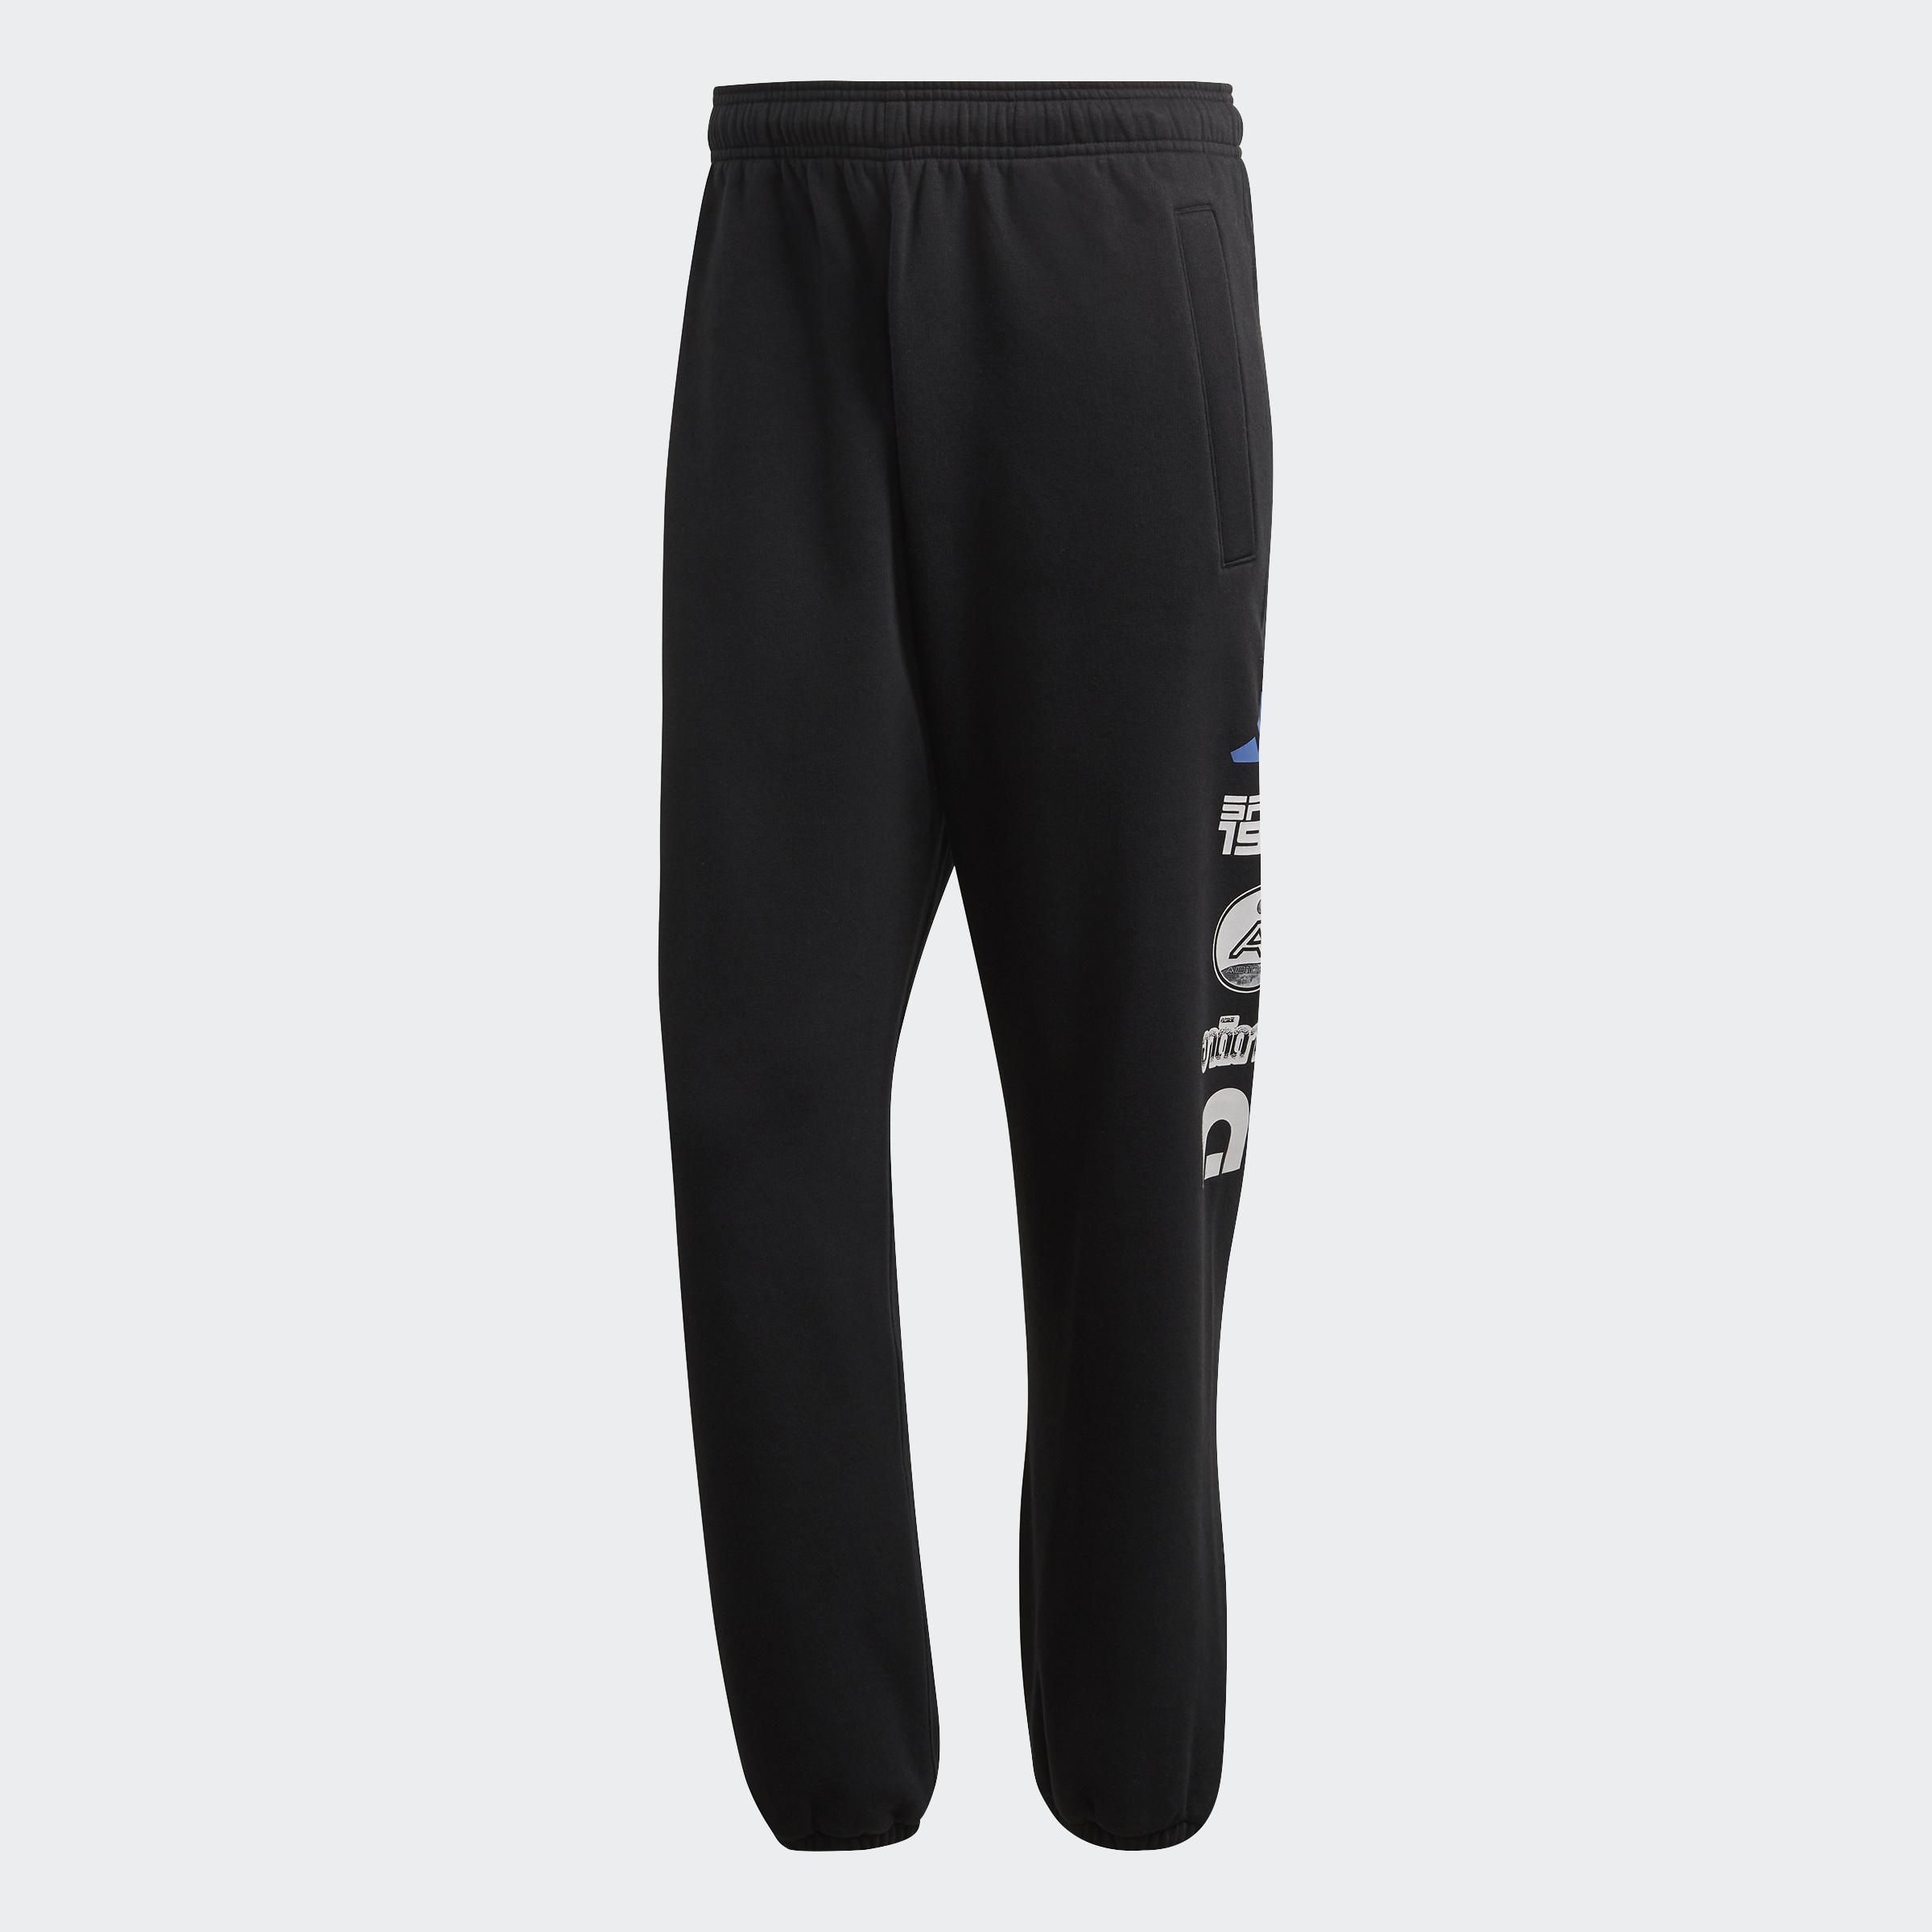 adidas-Pants-Men-039-s-Pants thumbnail 16